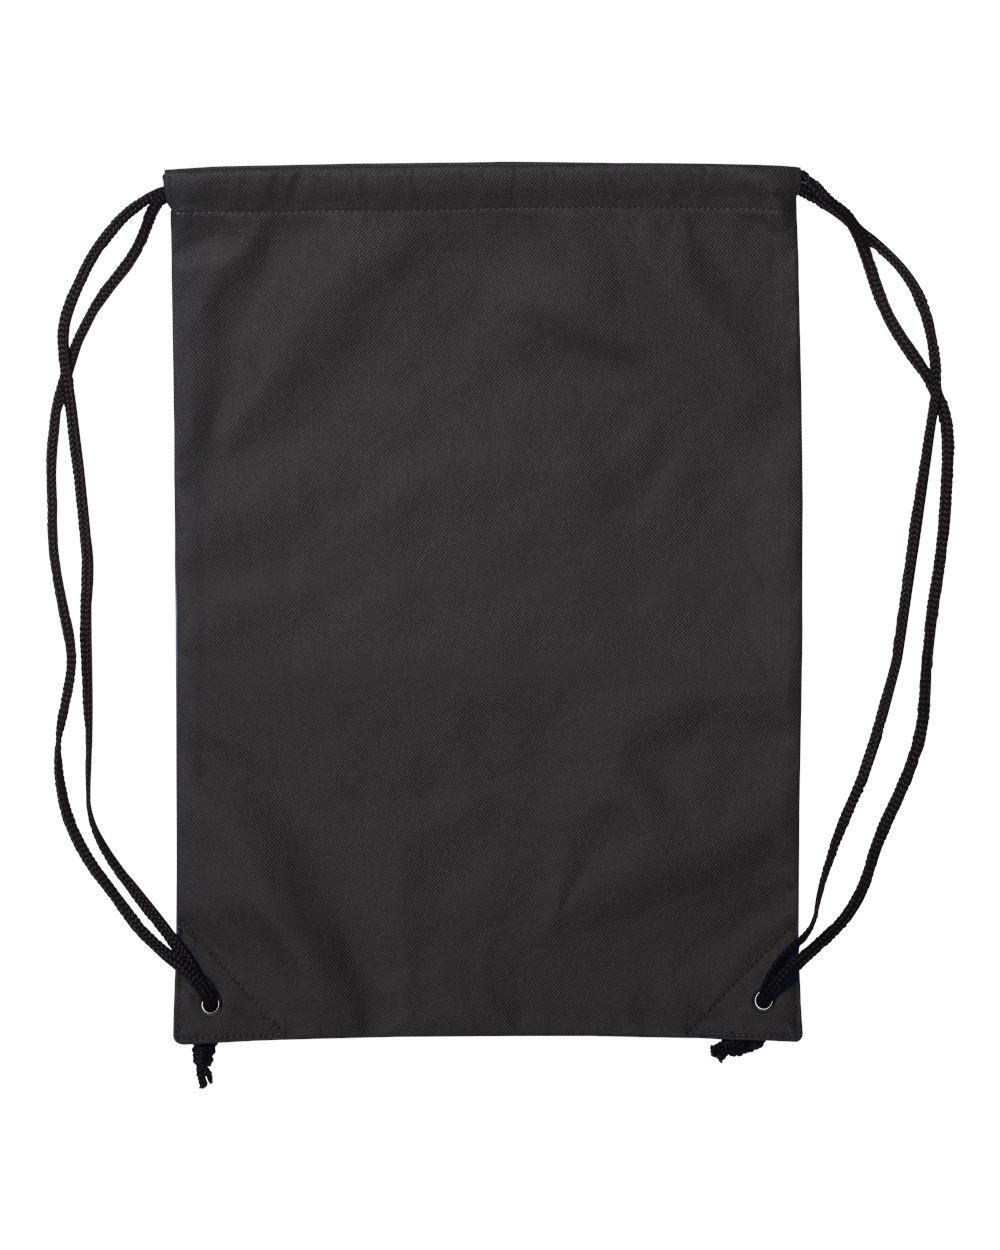 Up Balloon House Cinch Backpack Sackpack Tote Sack Lightweight Waterproof Large Storage Drawstring Bag For Men /& Women